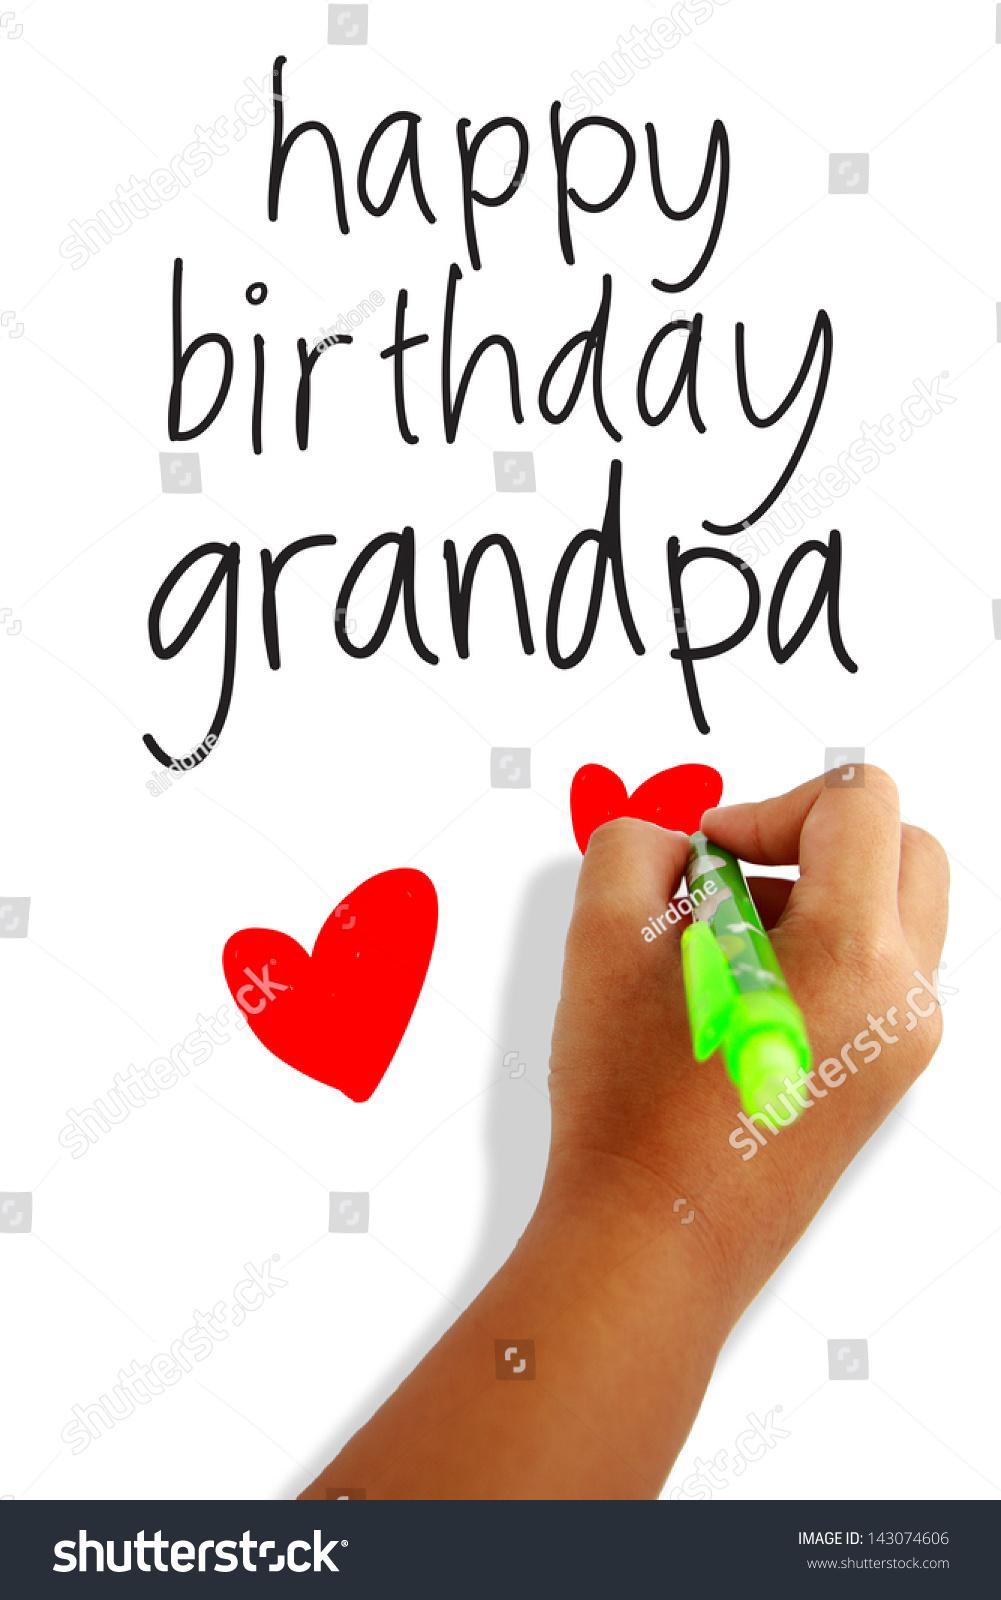 Happy Birthday Grandpa Greeting Card Photo 143074606 – Happy Birthday Grandpa Card